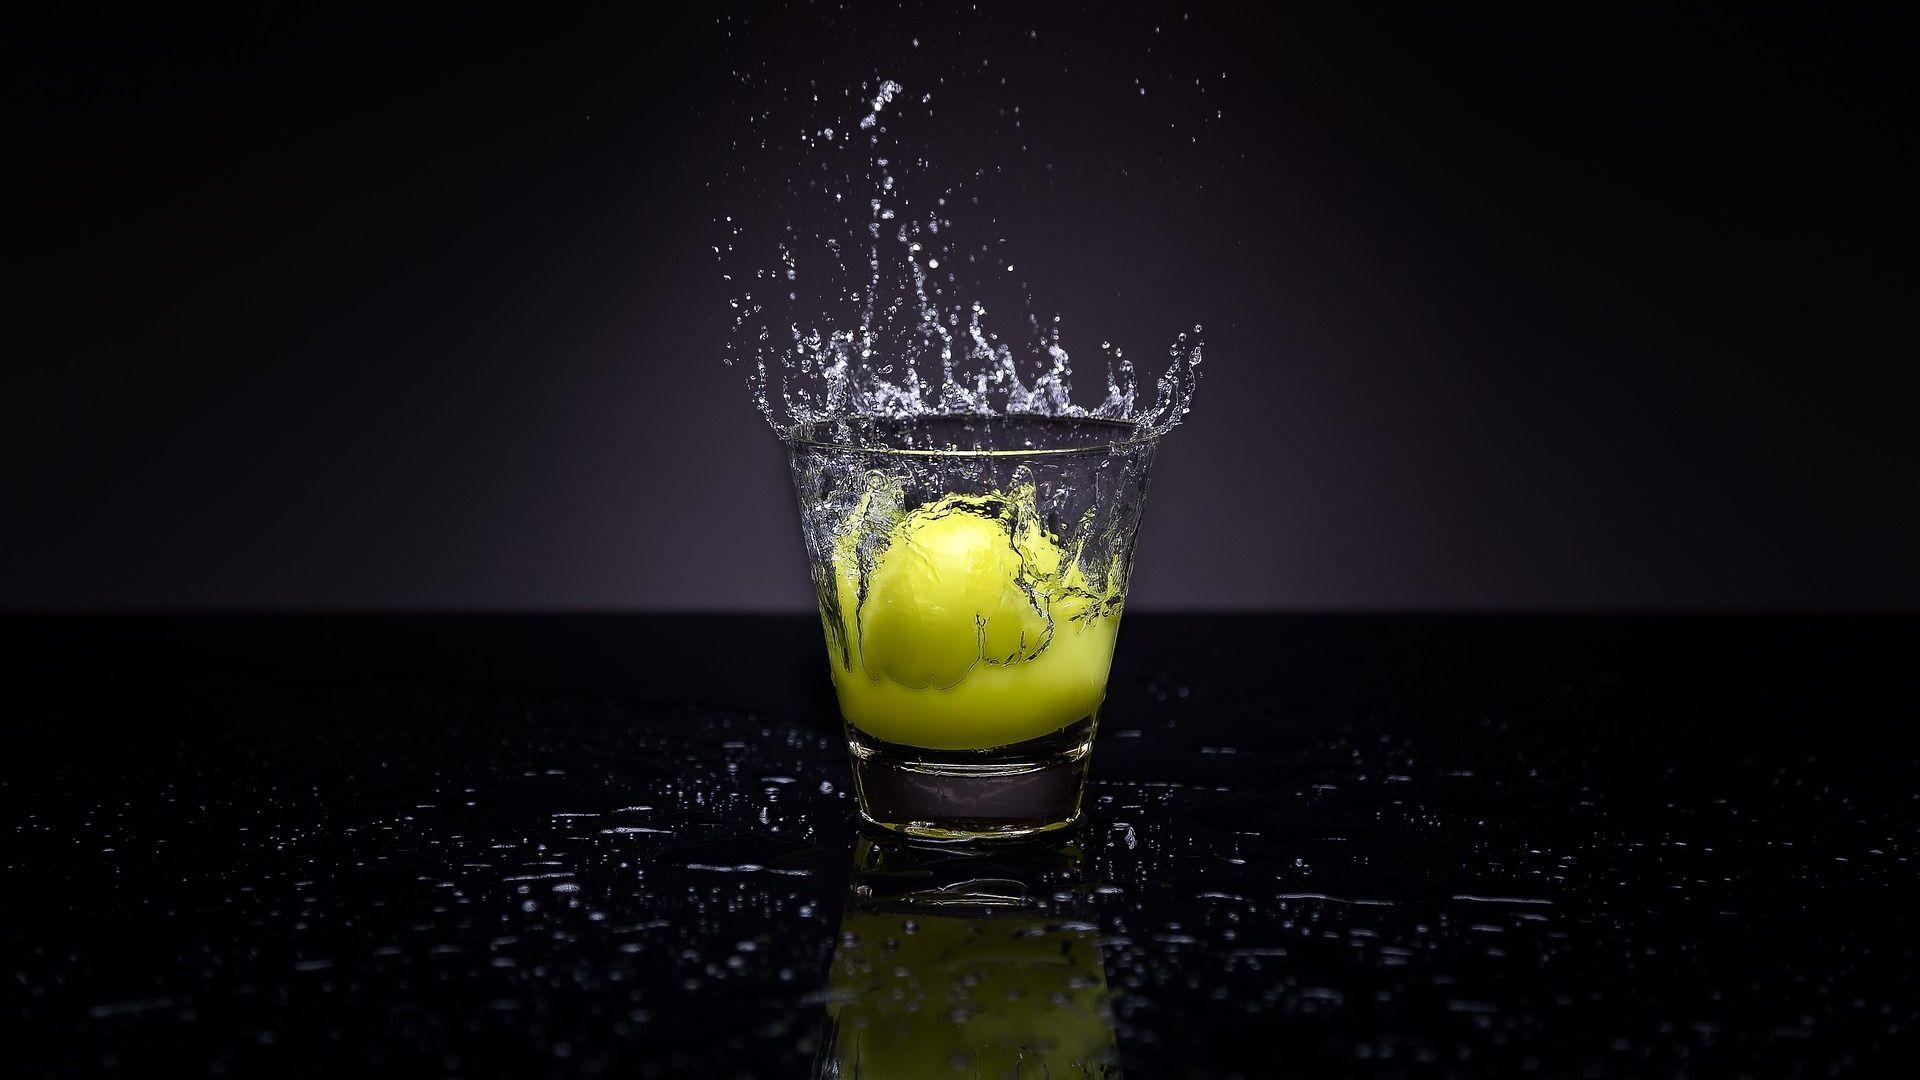 Sklenice vody s citronem - Sputnik Česká republika, 1920, 01.07.2021